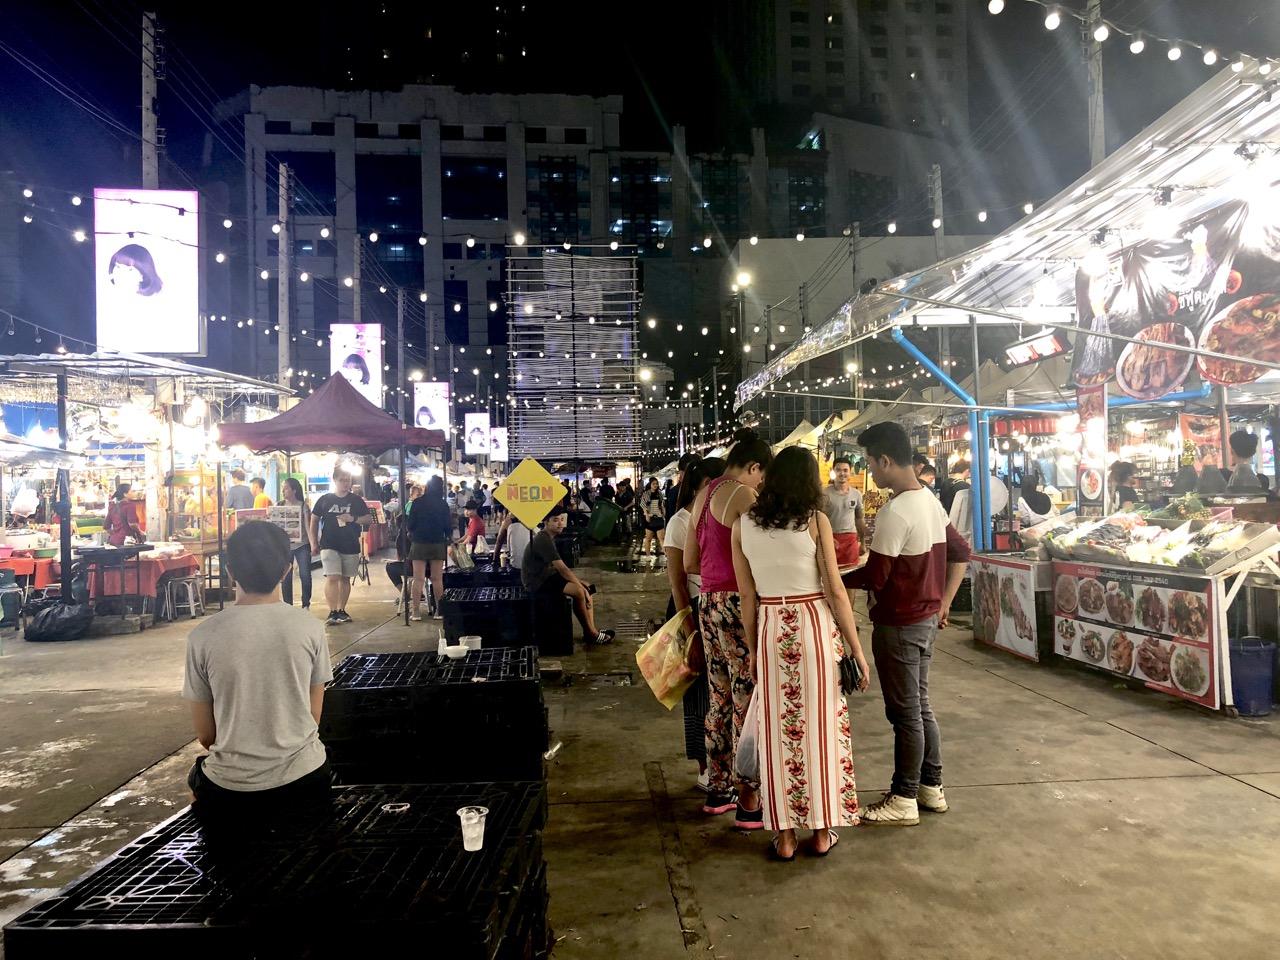 Ostolakossa bangkok kokemuksia